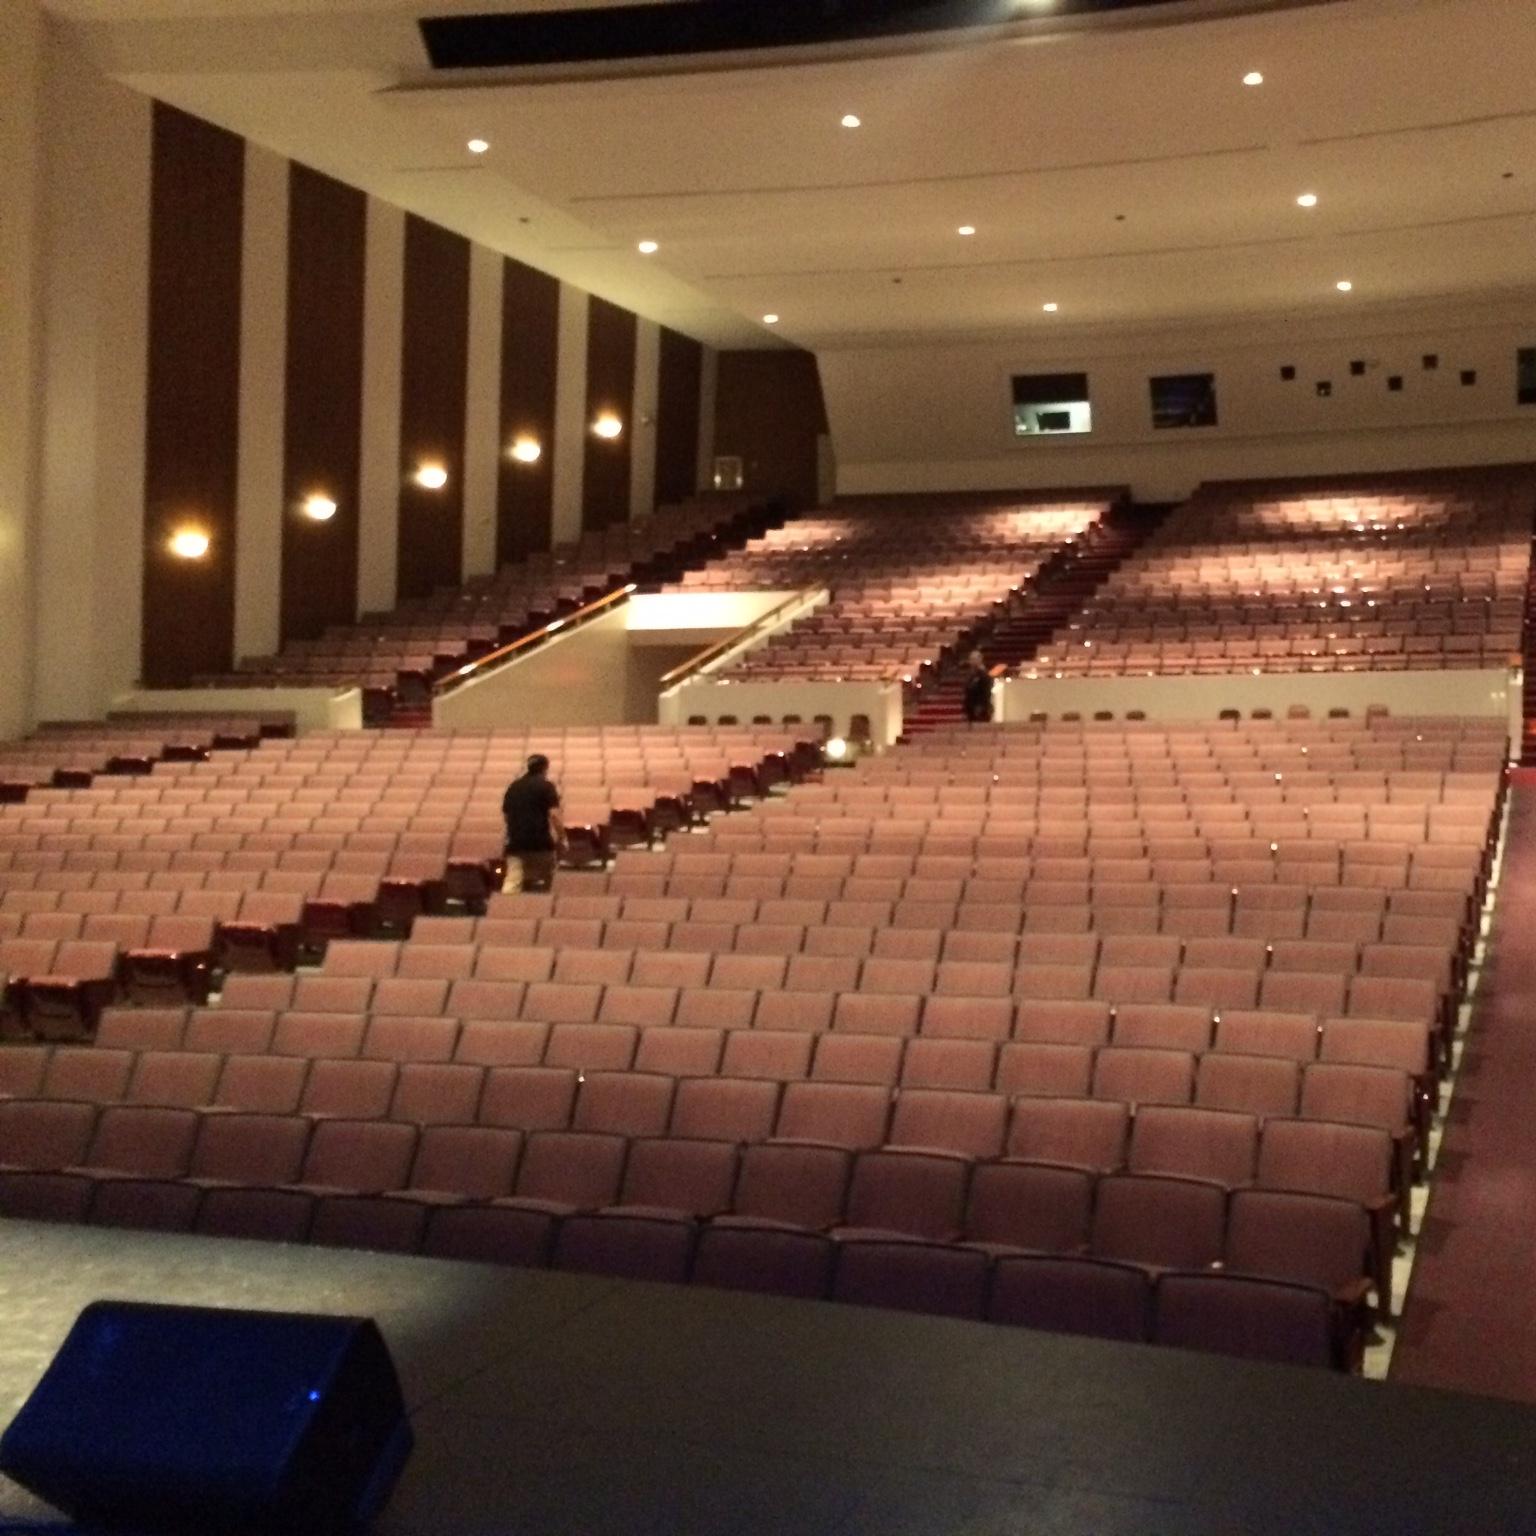 Oxnard Performing Arts Center